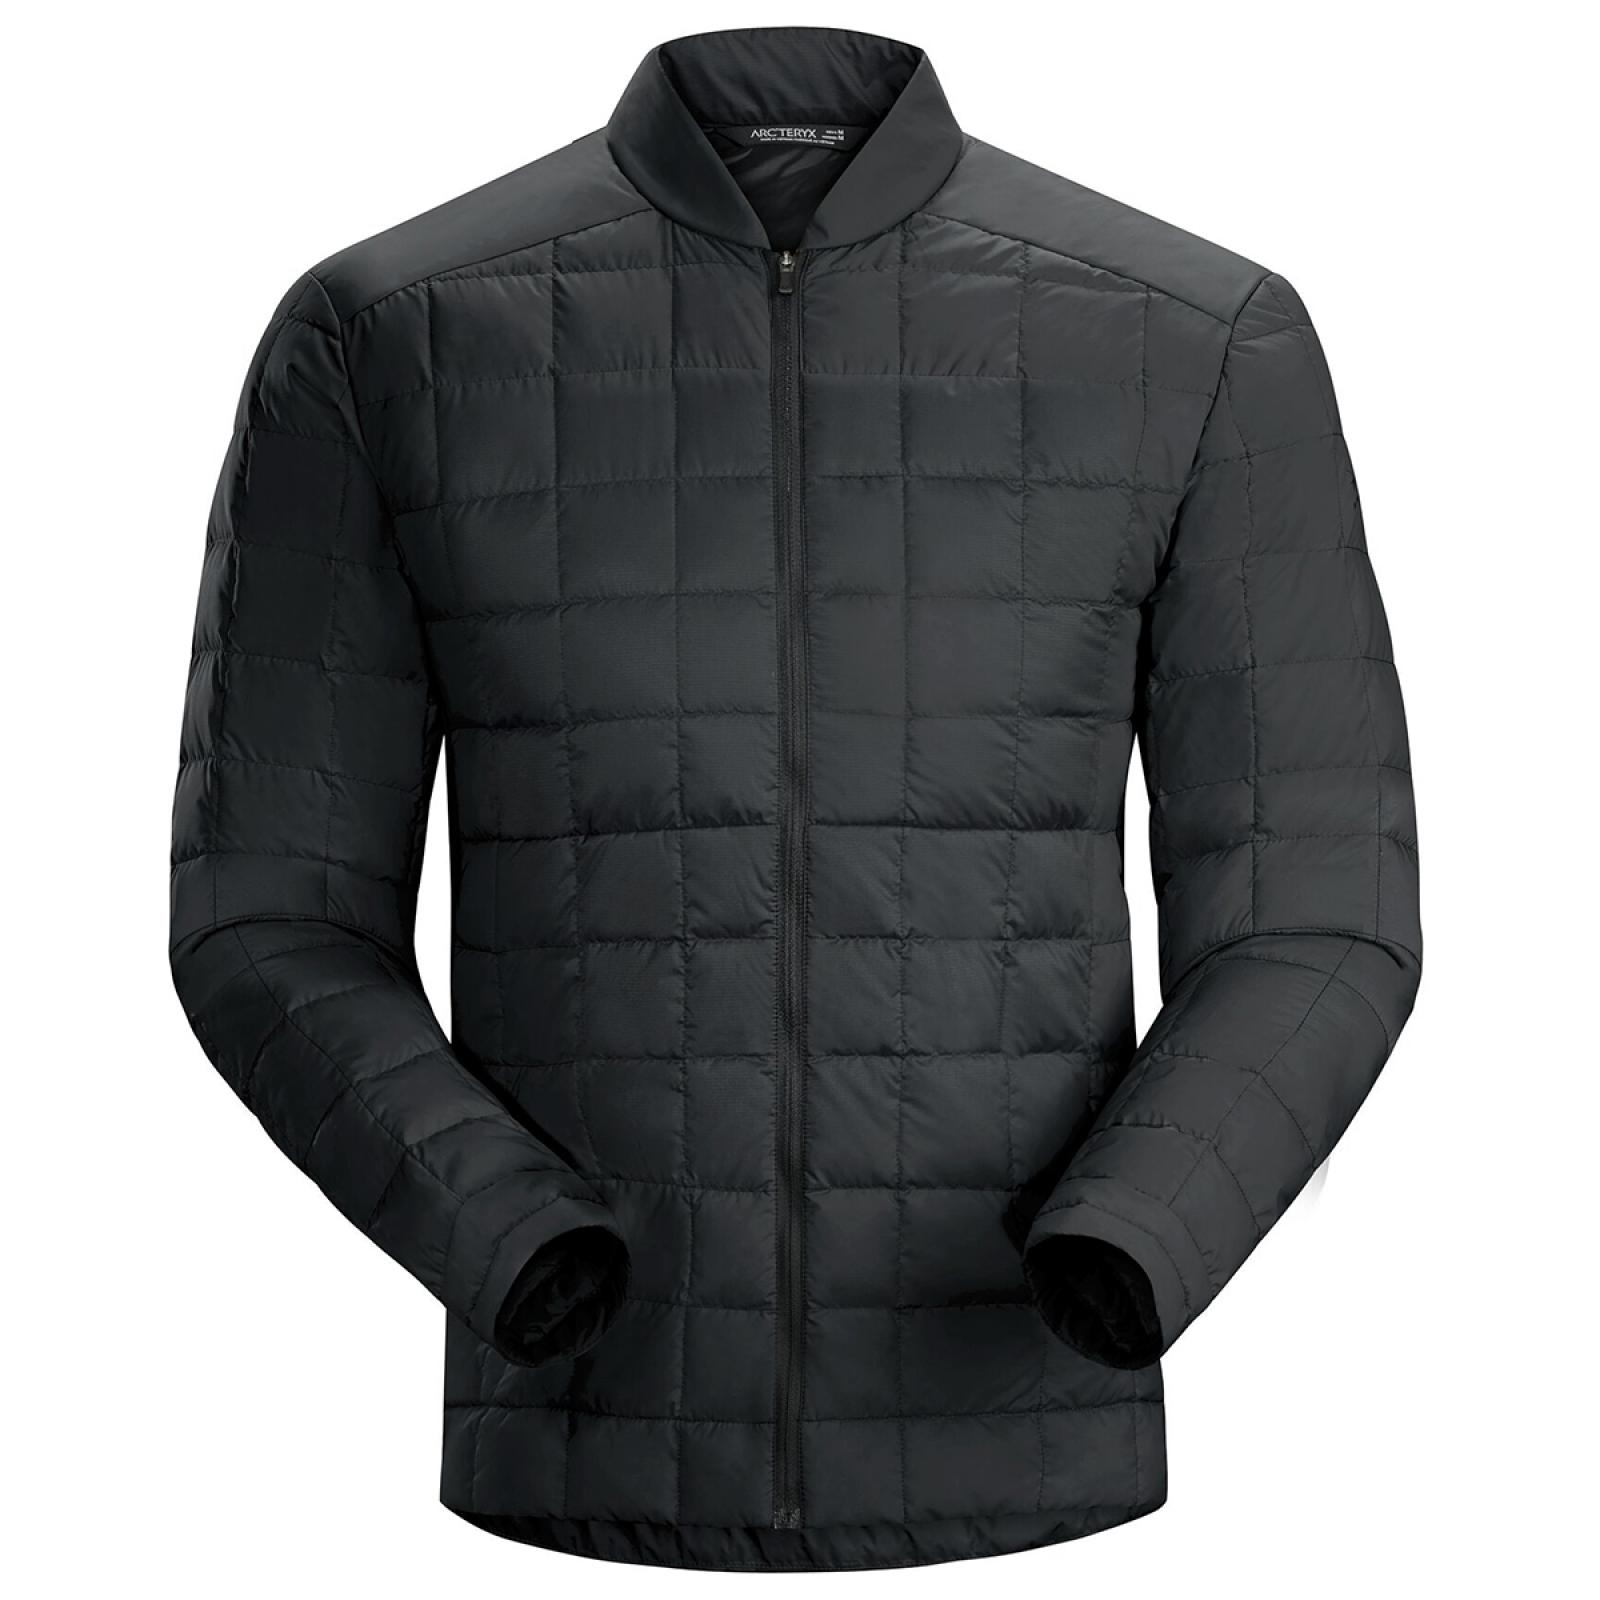 Arc'Teryx Giacca Rico Jacket Men's - 1